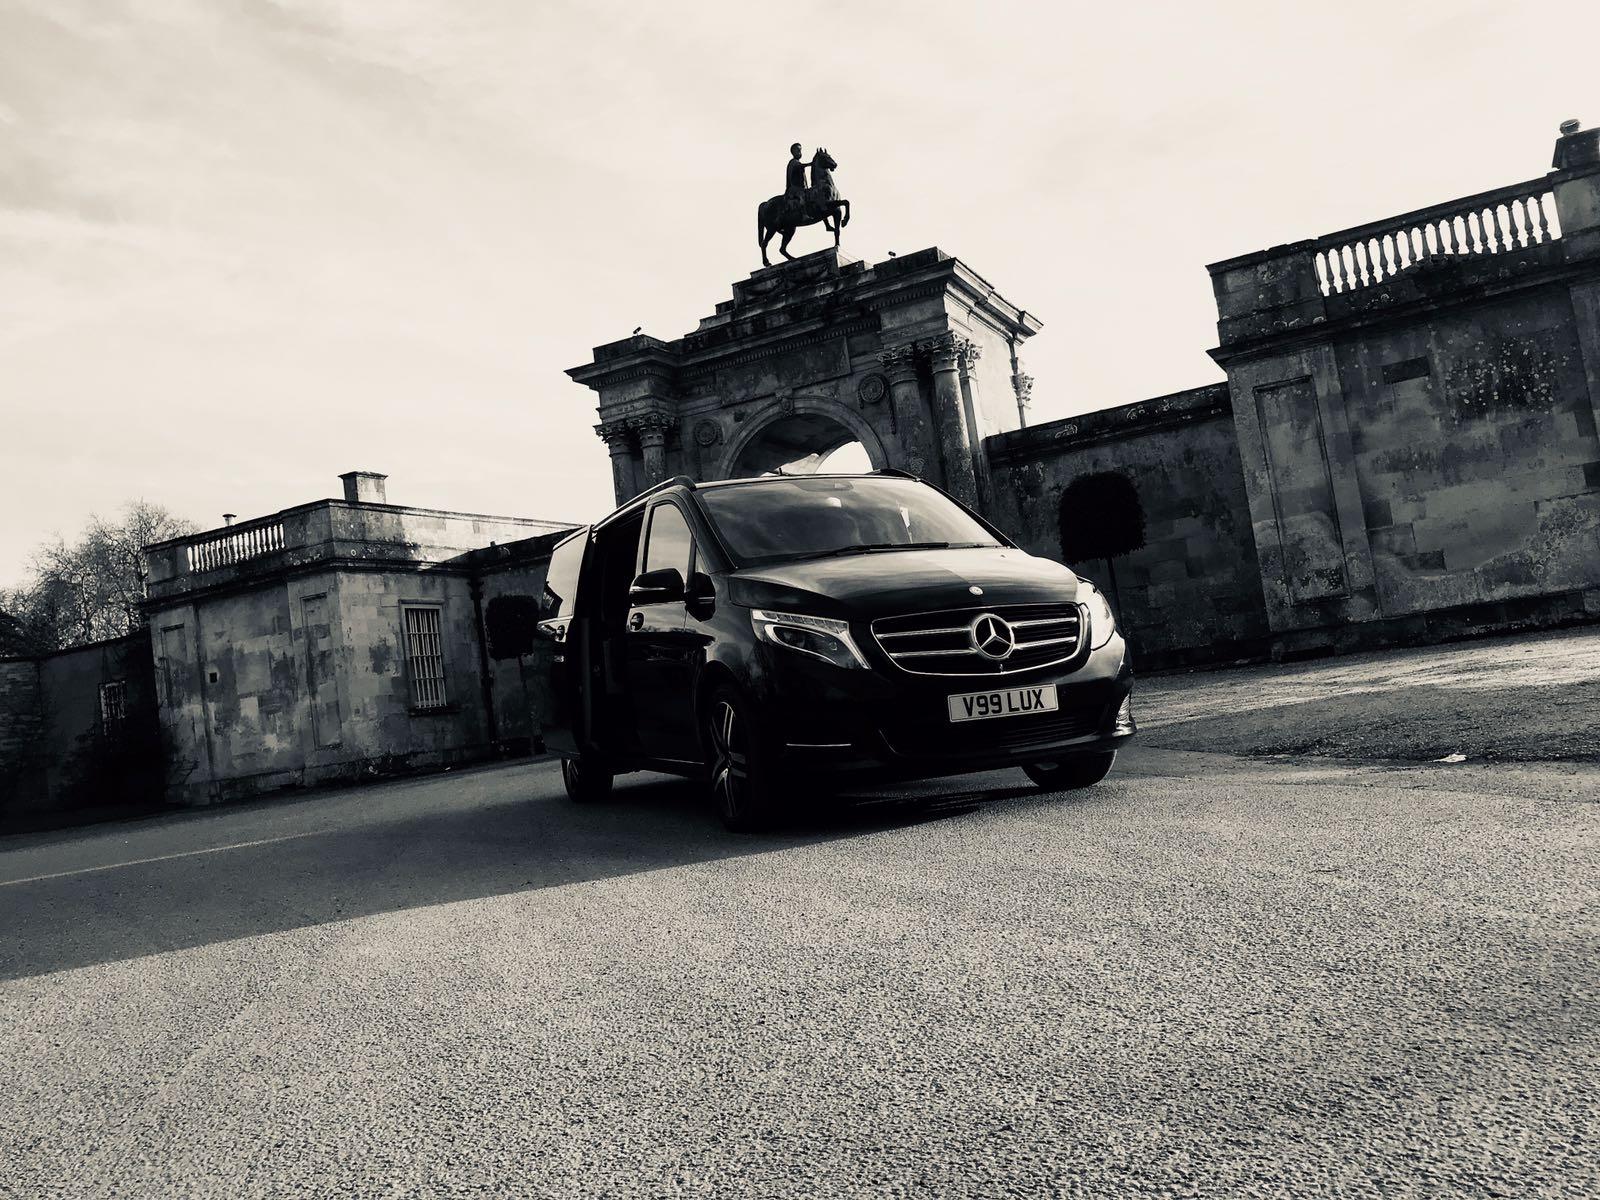 luxury prom car london